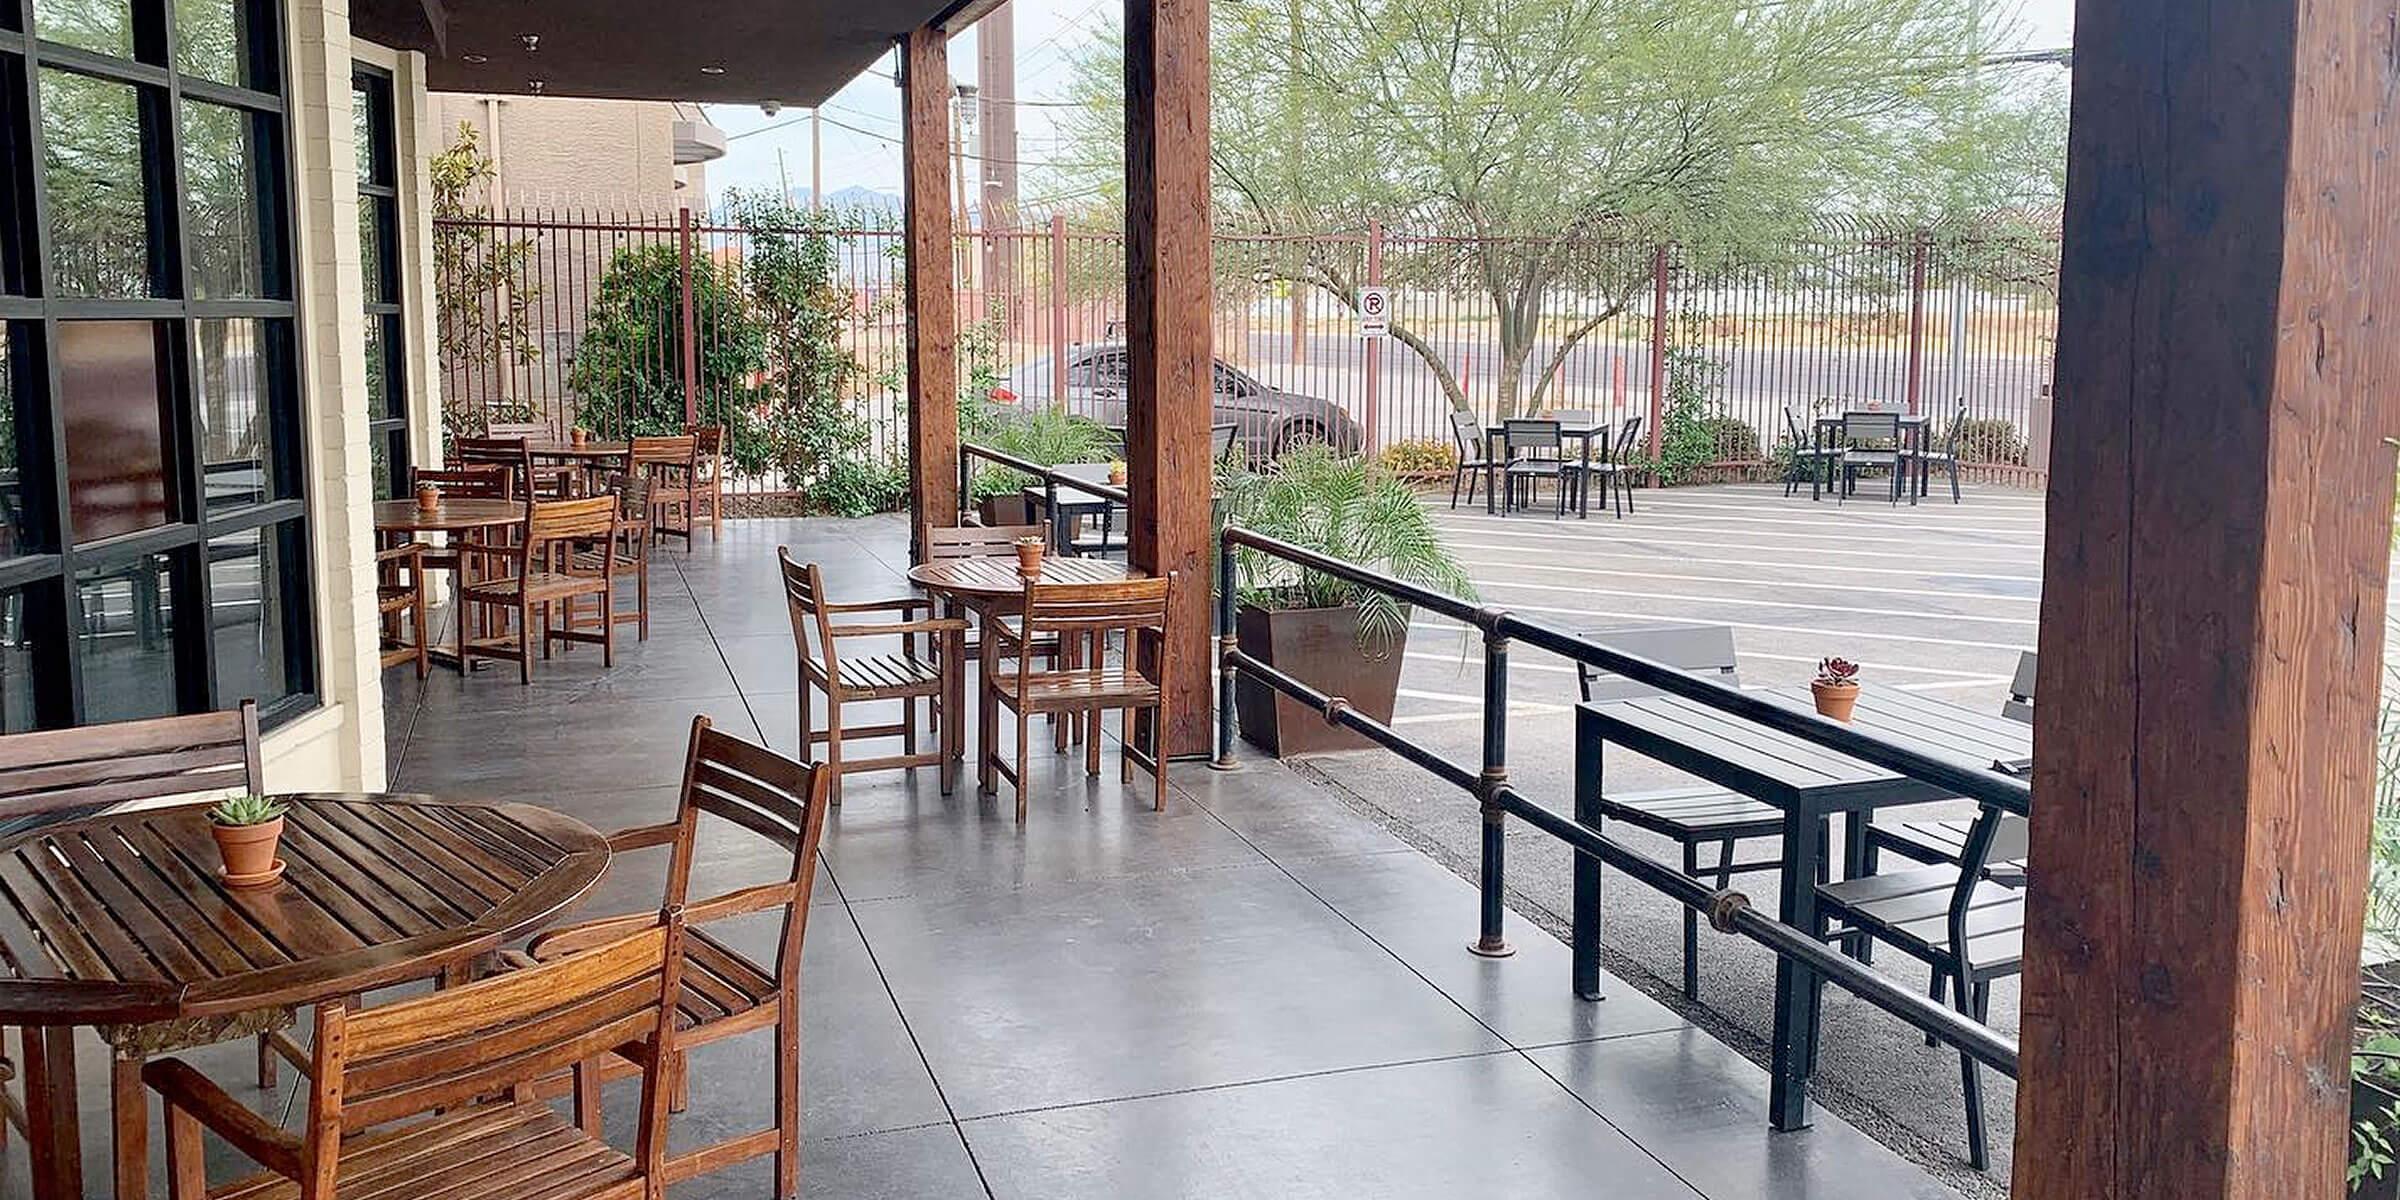 Outside on the patio at Tenaya Creek Brewery in Las Vegas, Nevada